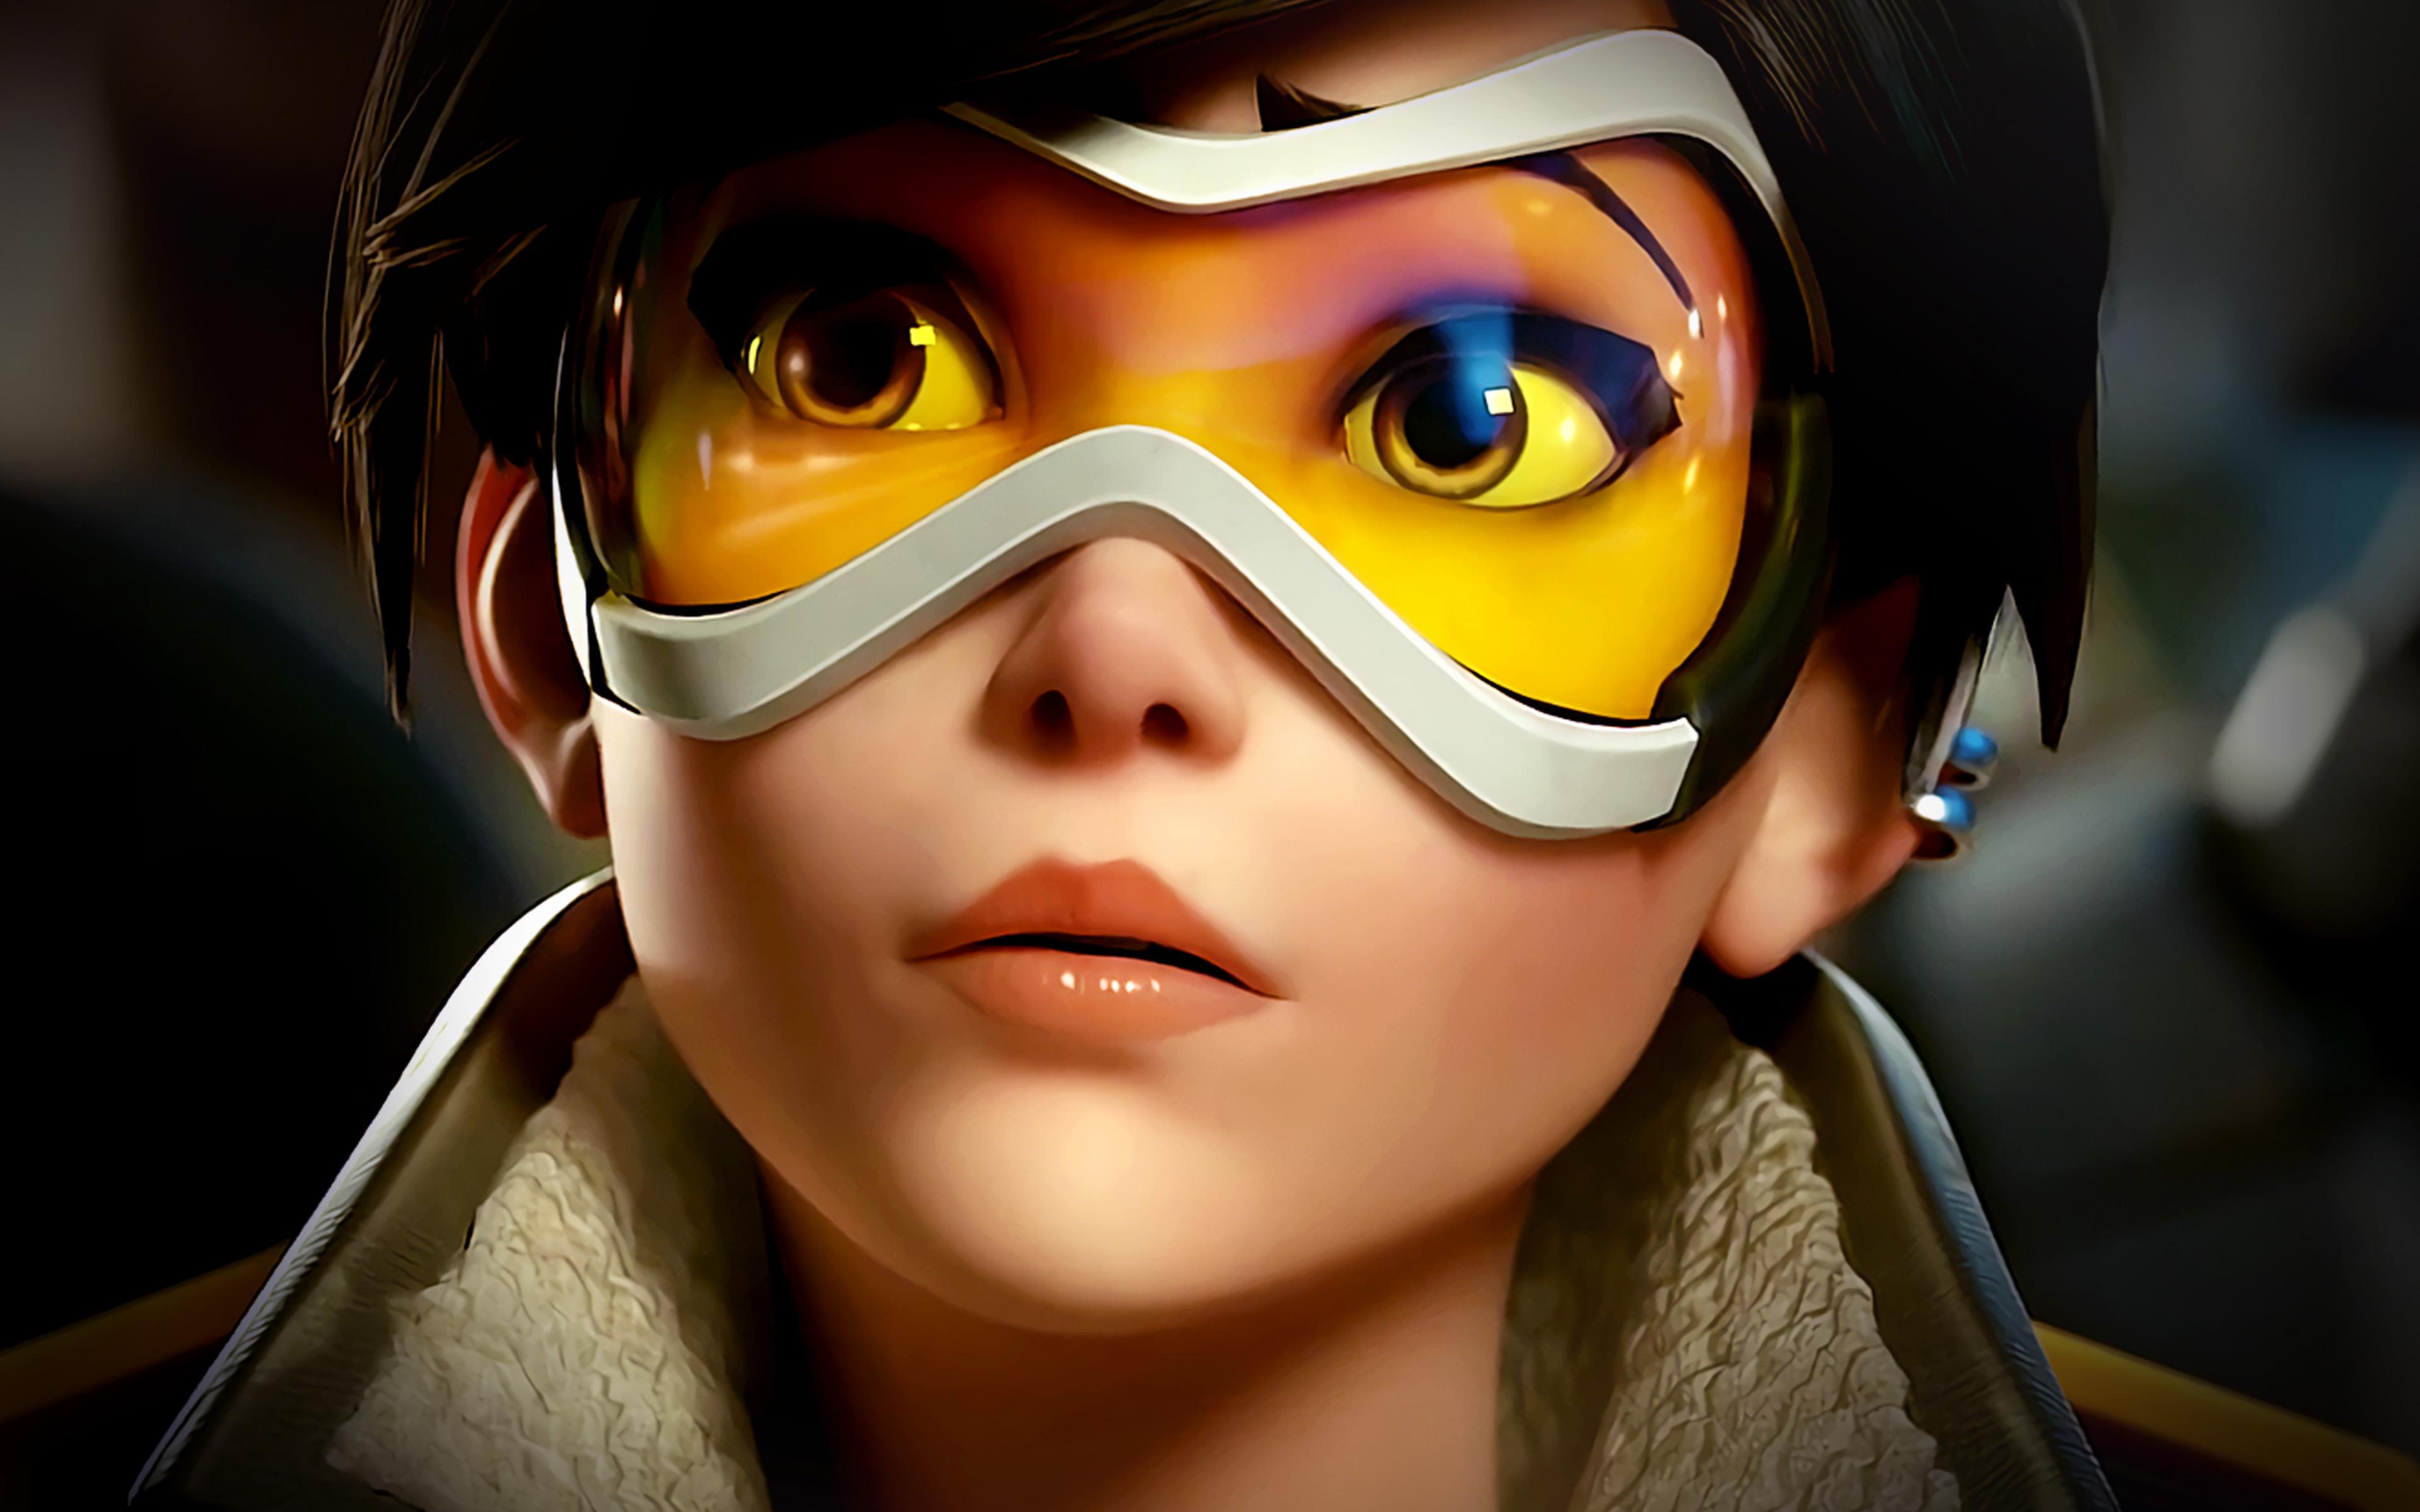 ar95-overwatch-tracer-england-game-art-illustration-wallpaper